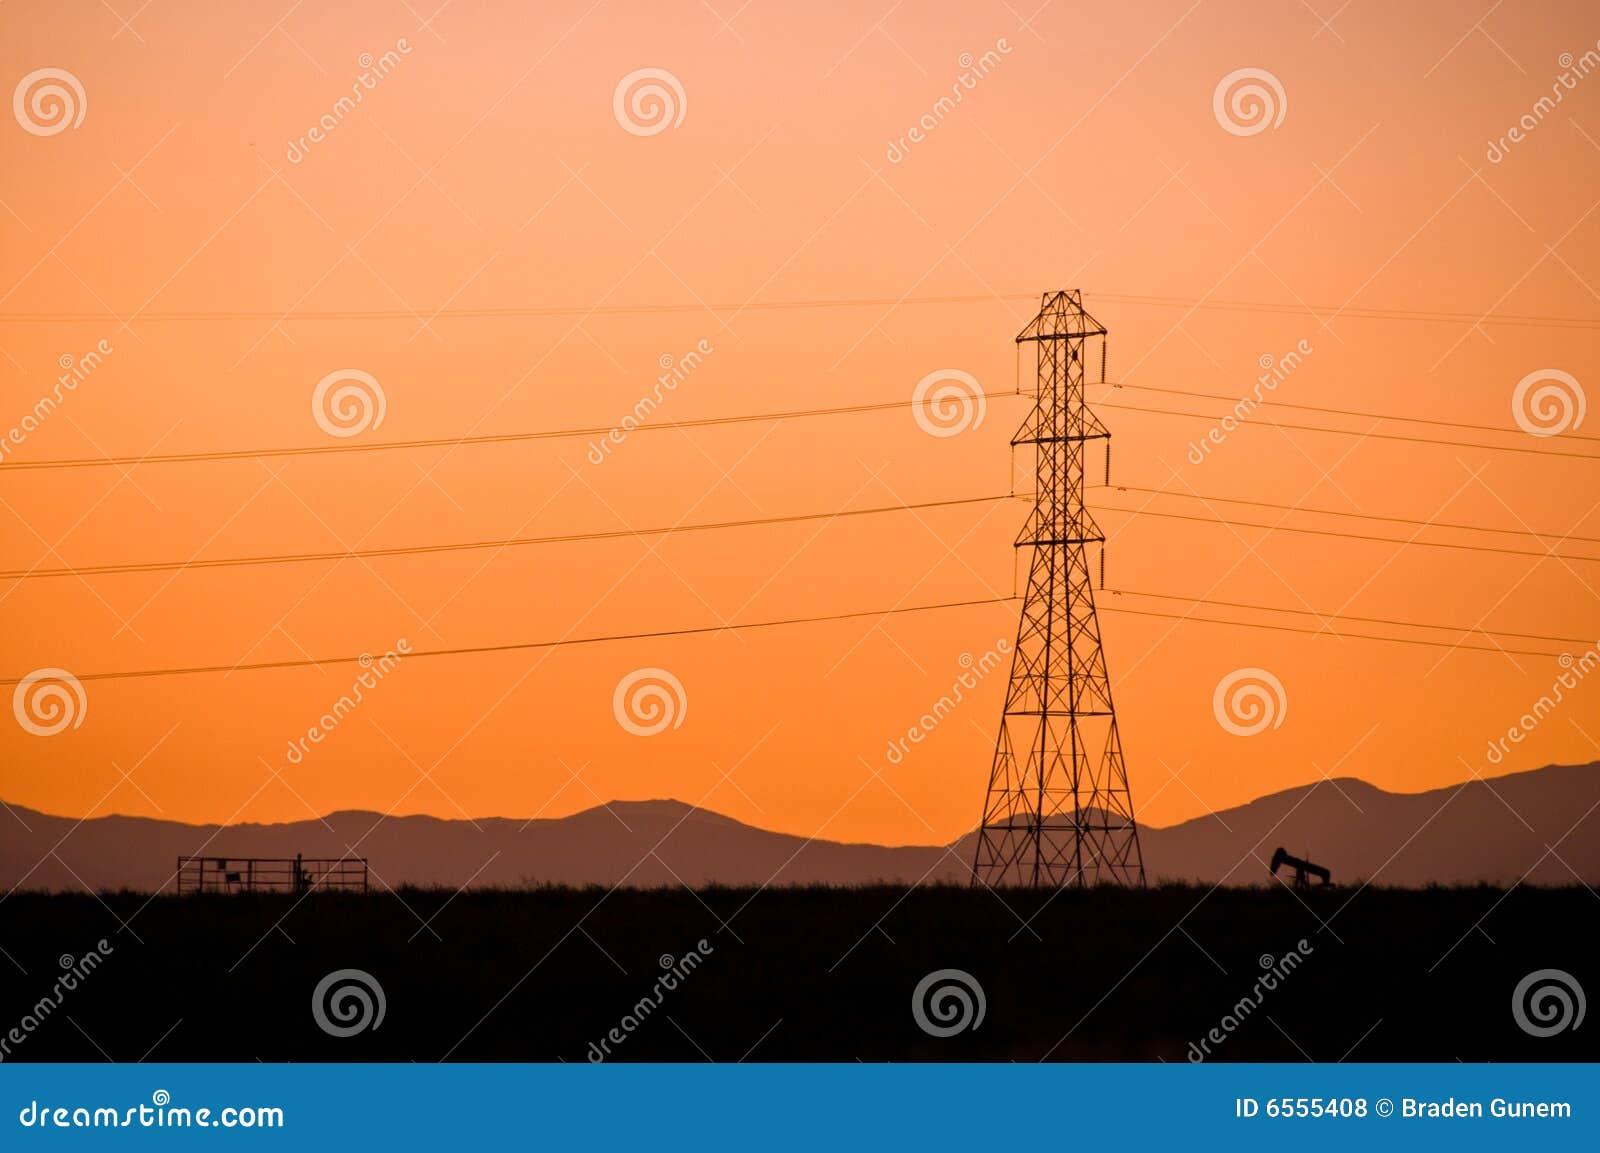 Power line sillouette